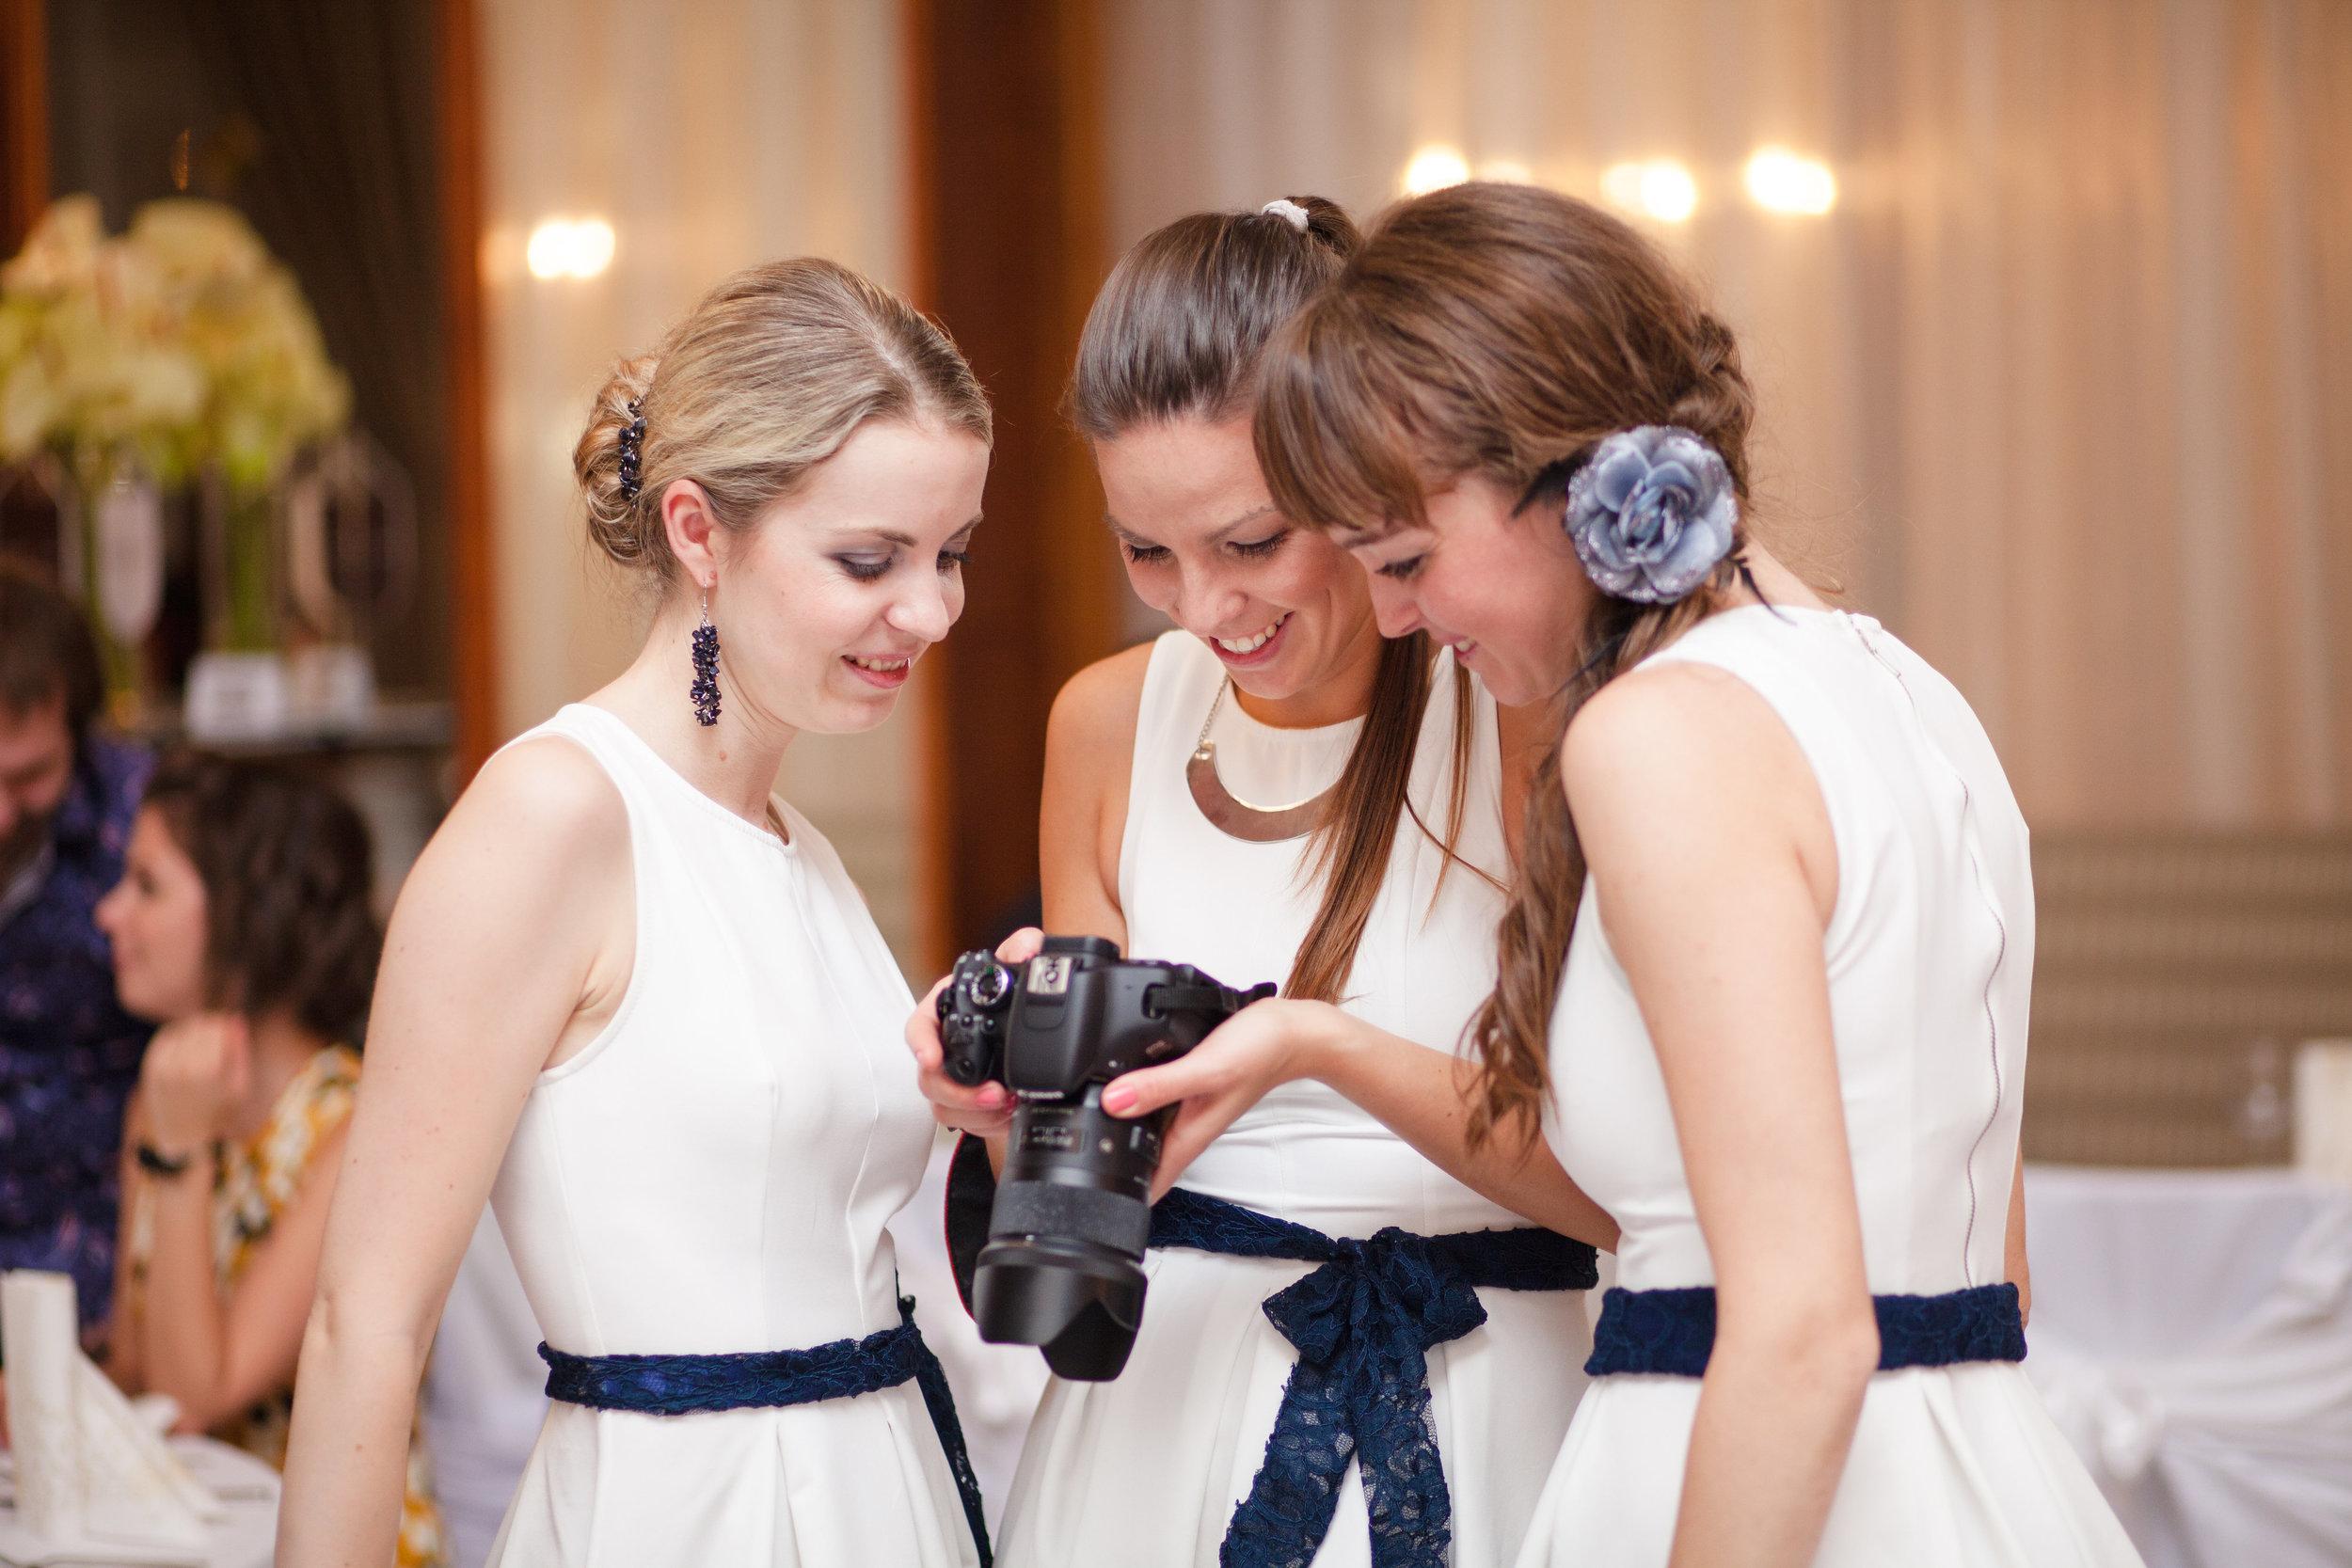 destination-wedding-photographer-slovakia-bratislava-bridesmaids-camera.jpg